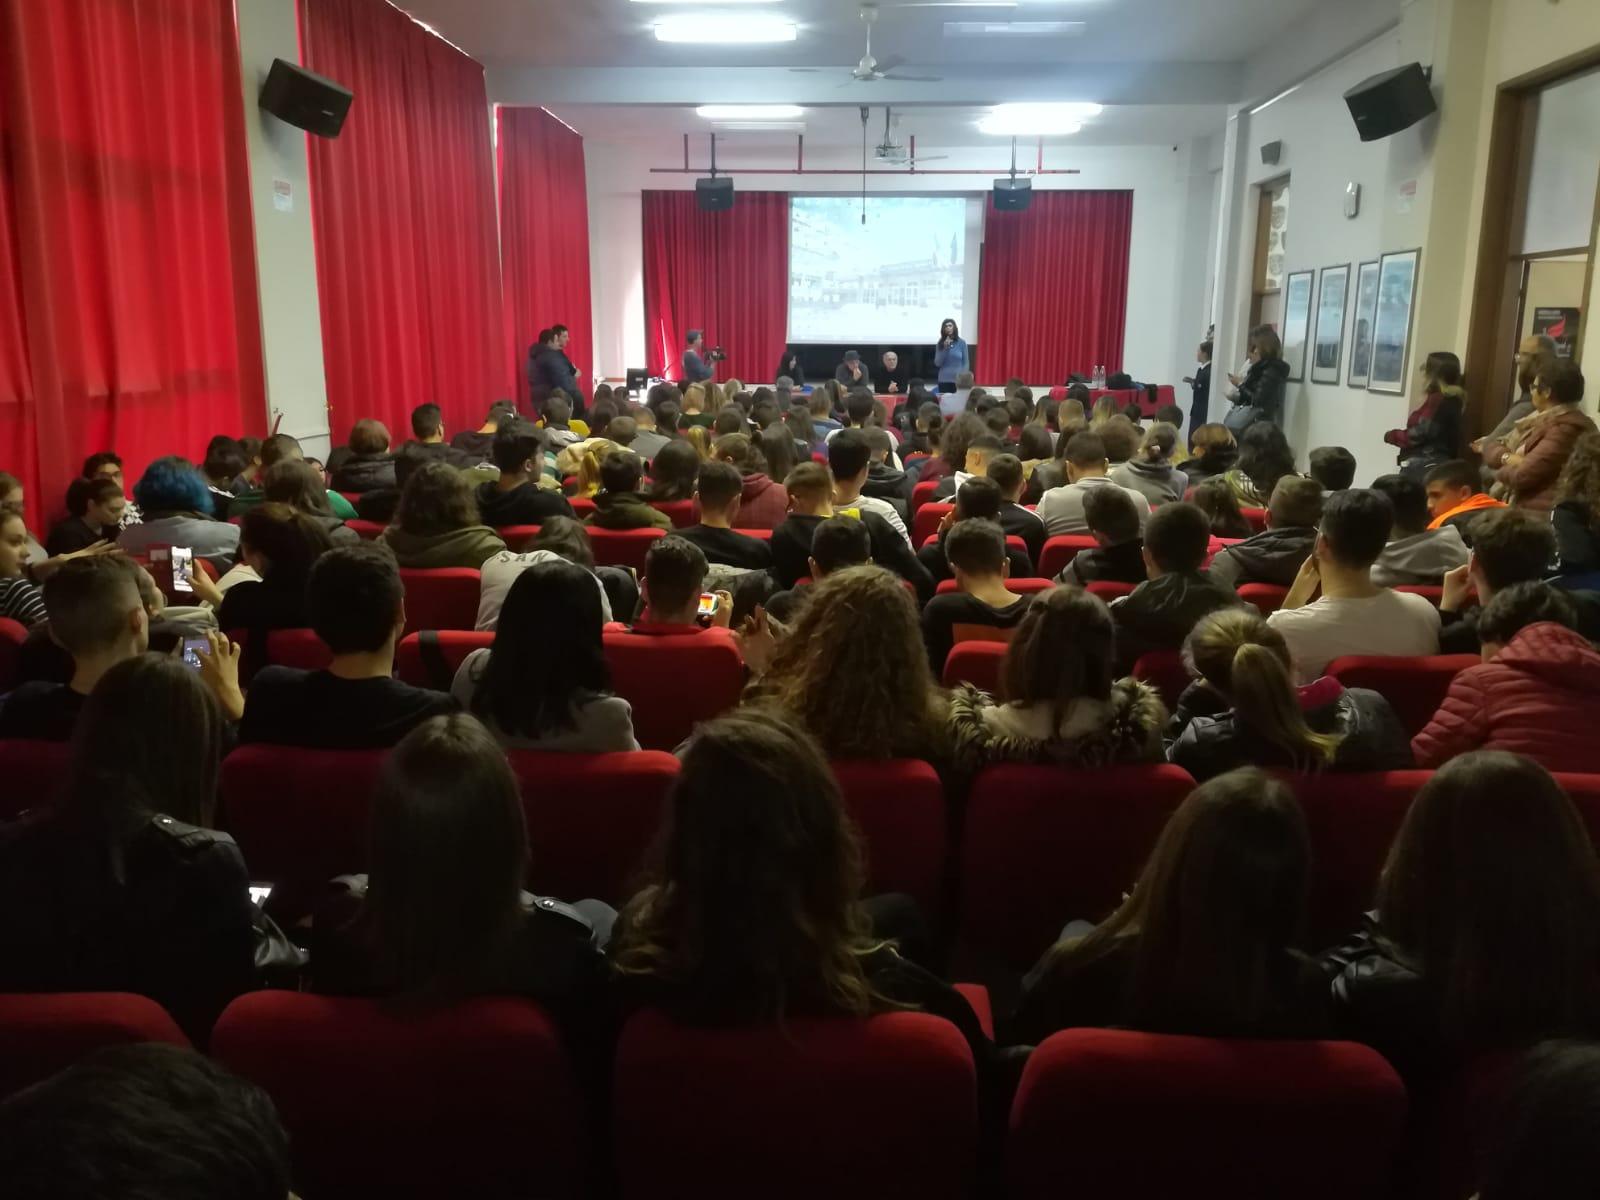 Istituto Santa Caterina - Amendola